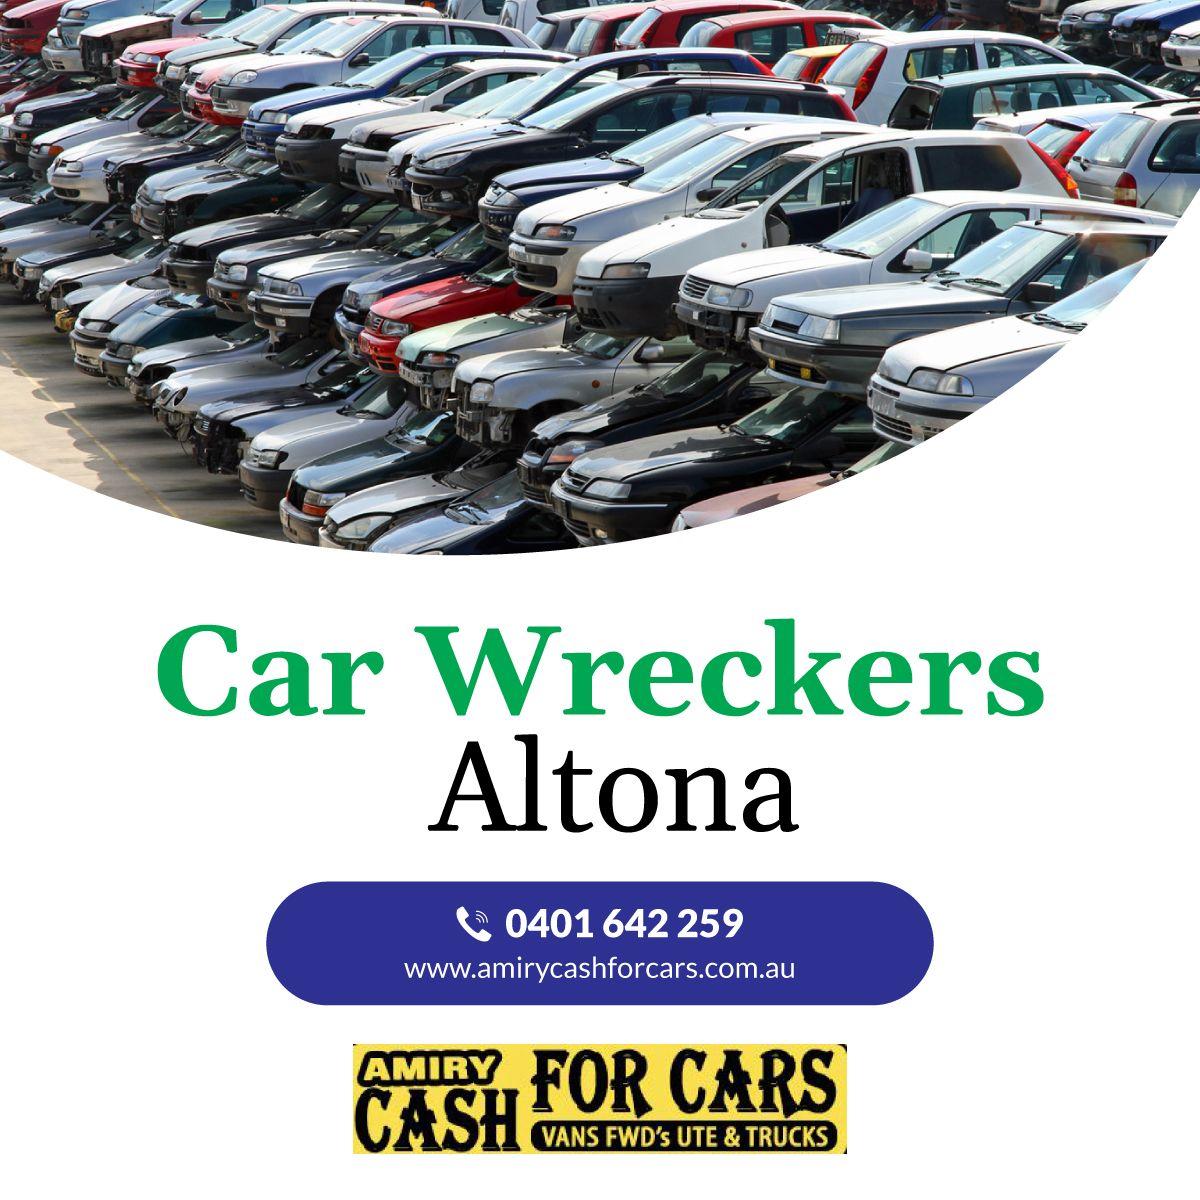 Car Wreckers in Altona in 2020 Wrecker, Car, How to remove